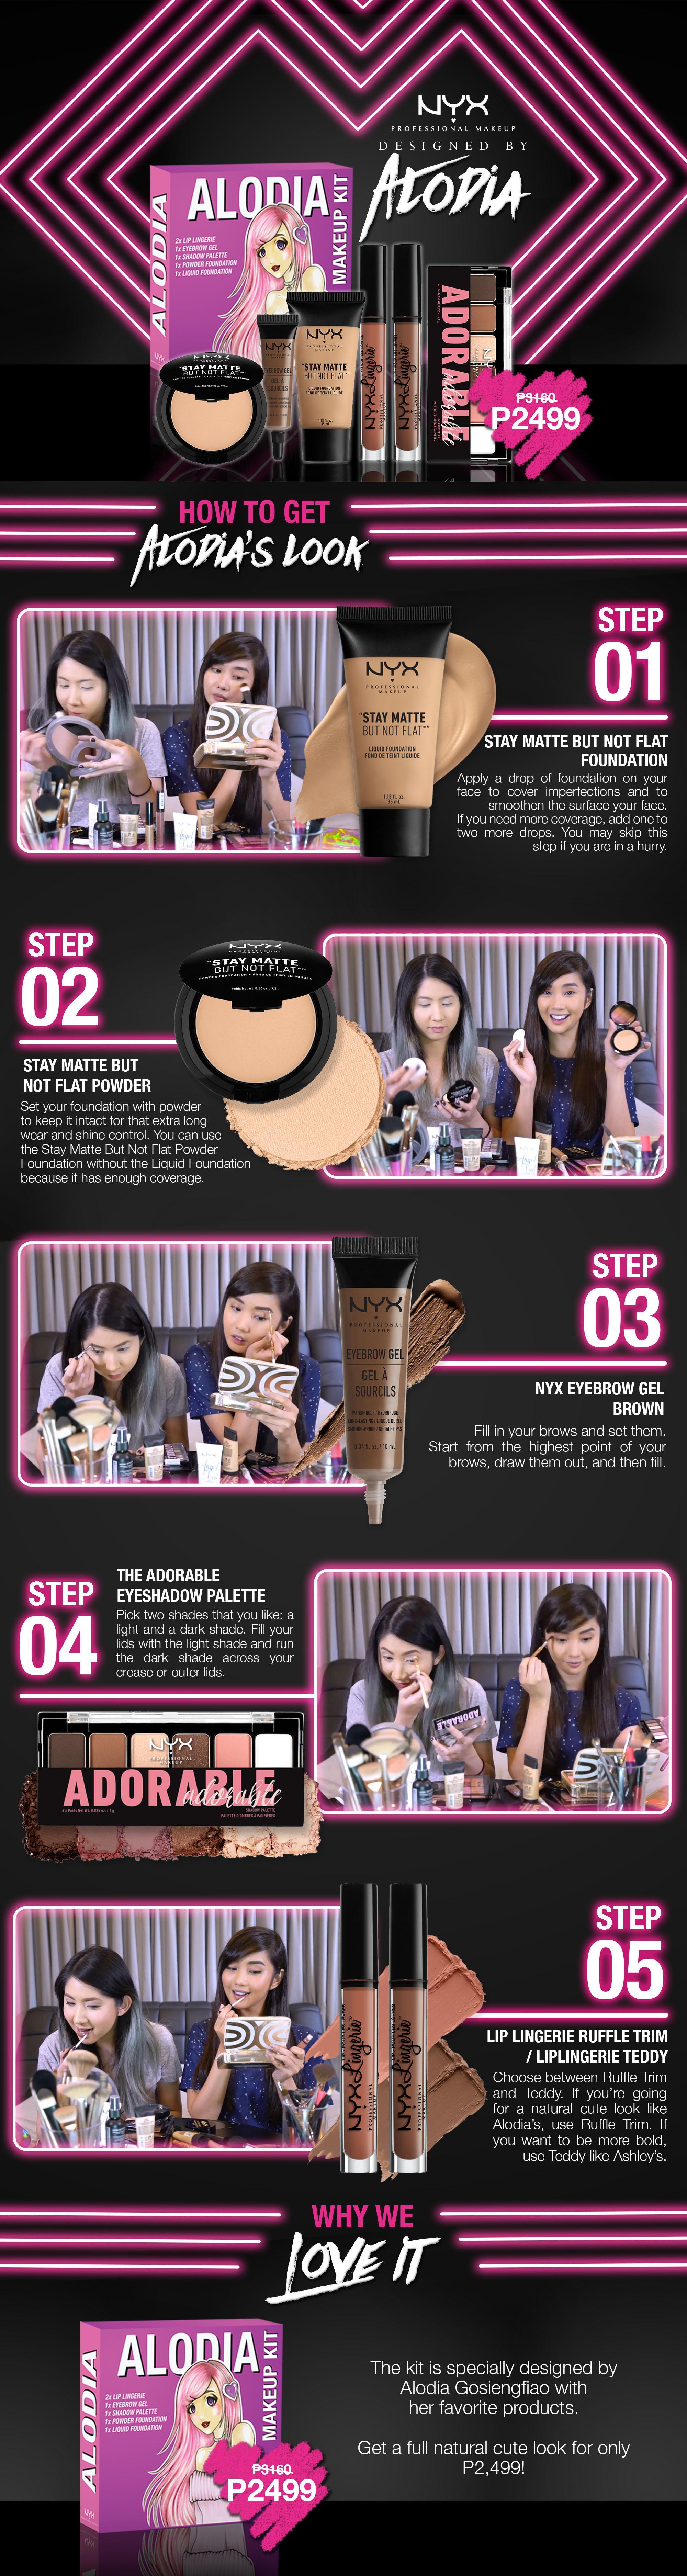 Alodia Gosengfiao NYX Makeup Kits are now available! Order